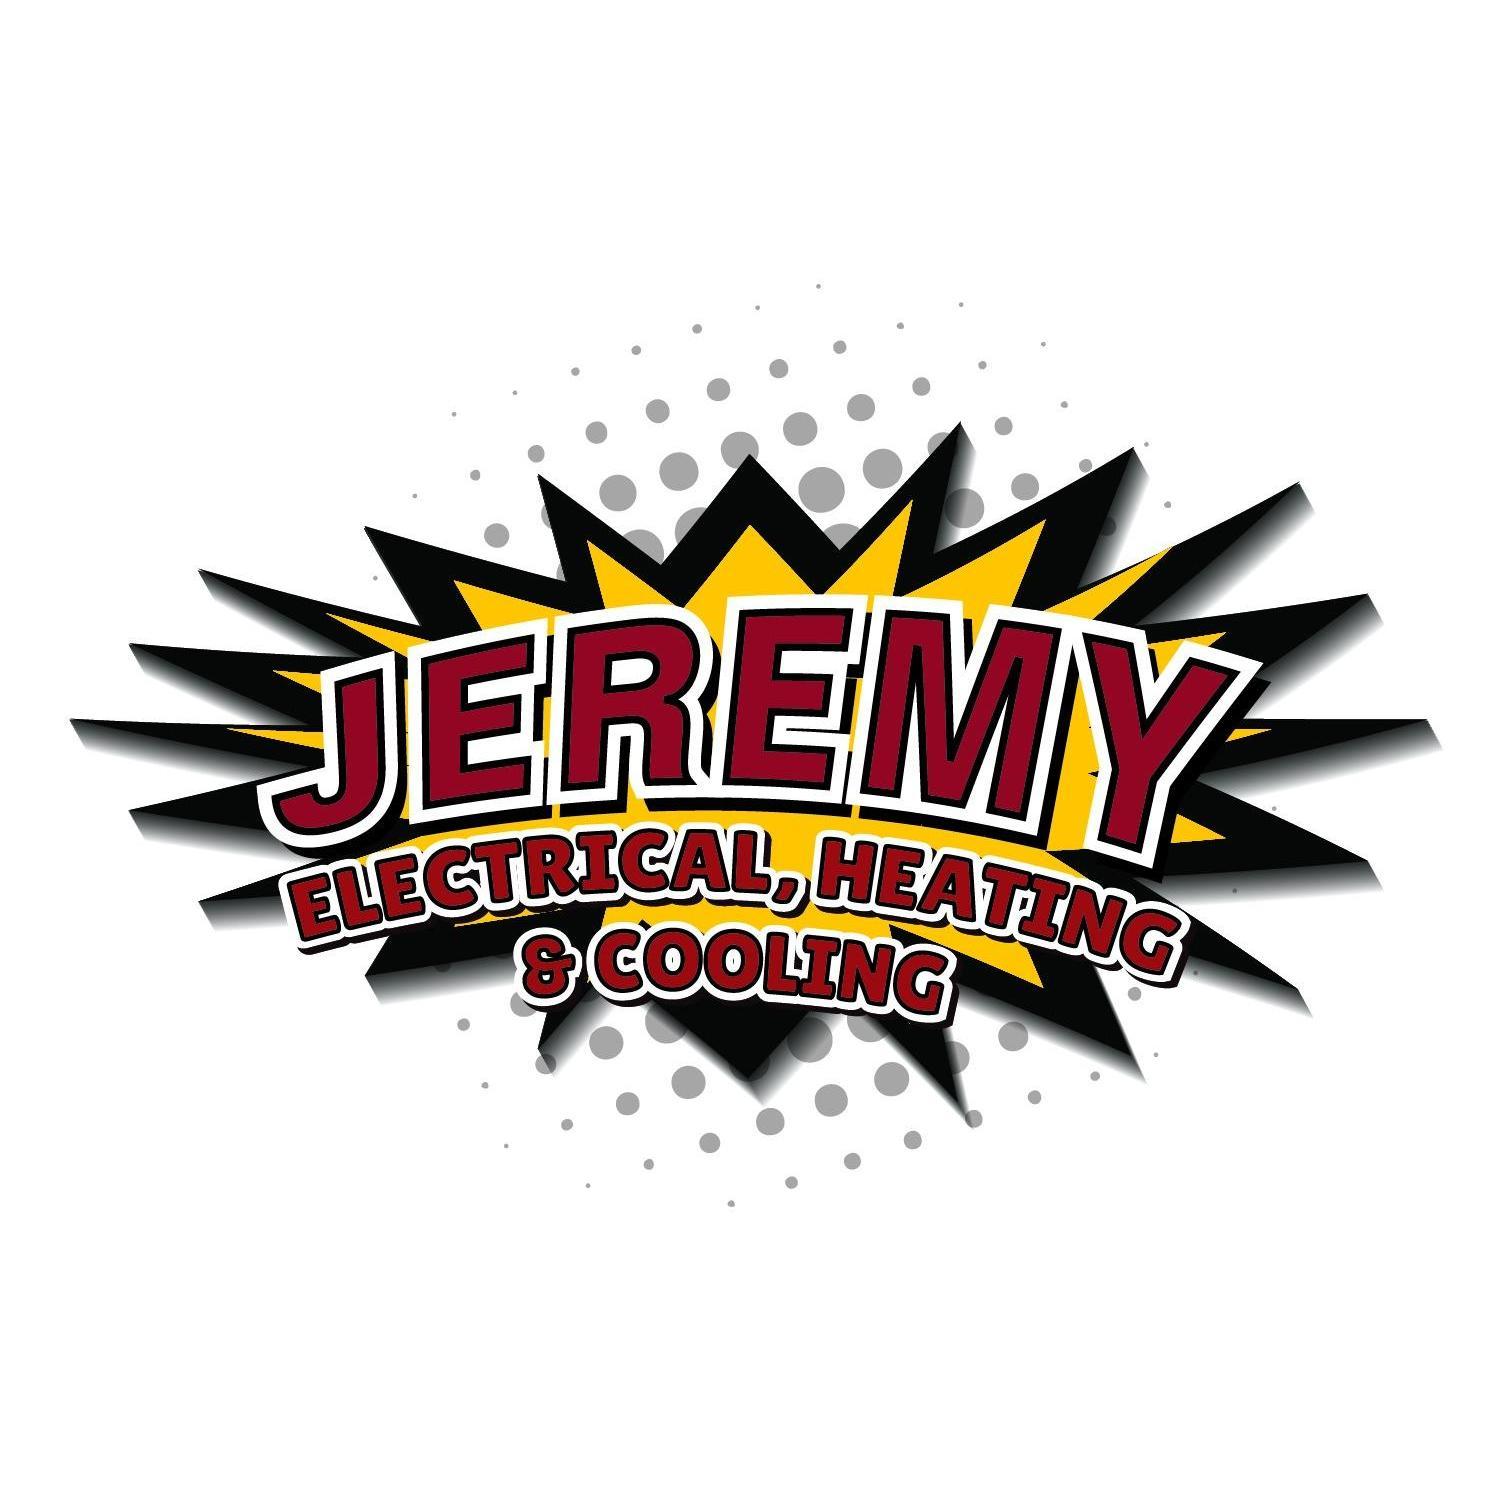 Jeremy Electrical - Mission, KS - Electricians